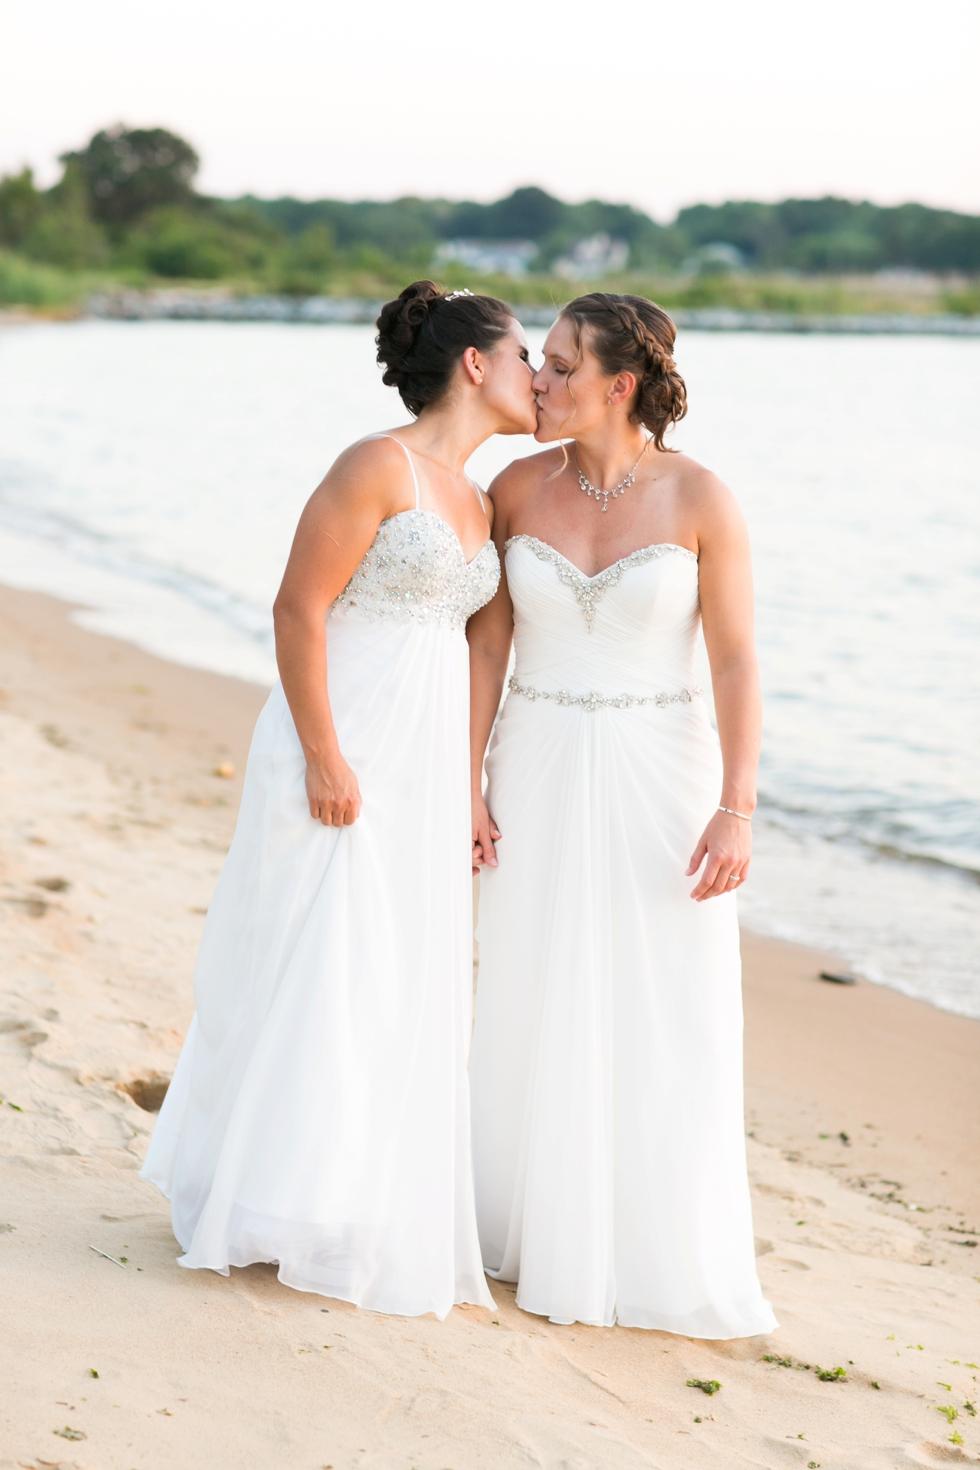 Chesapeake Bay Beach Club Two Brides Wedding Photographer